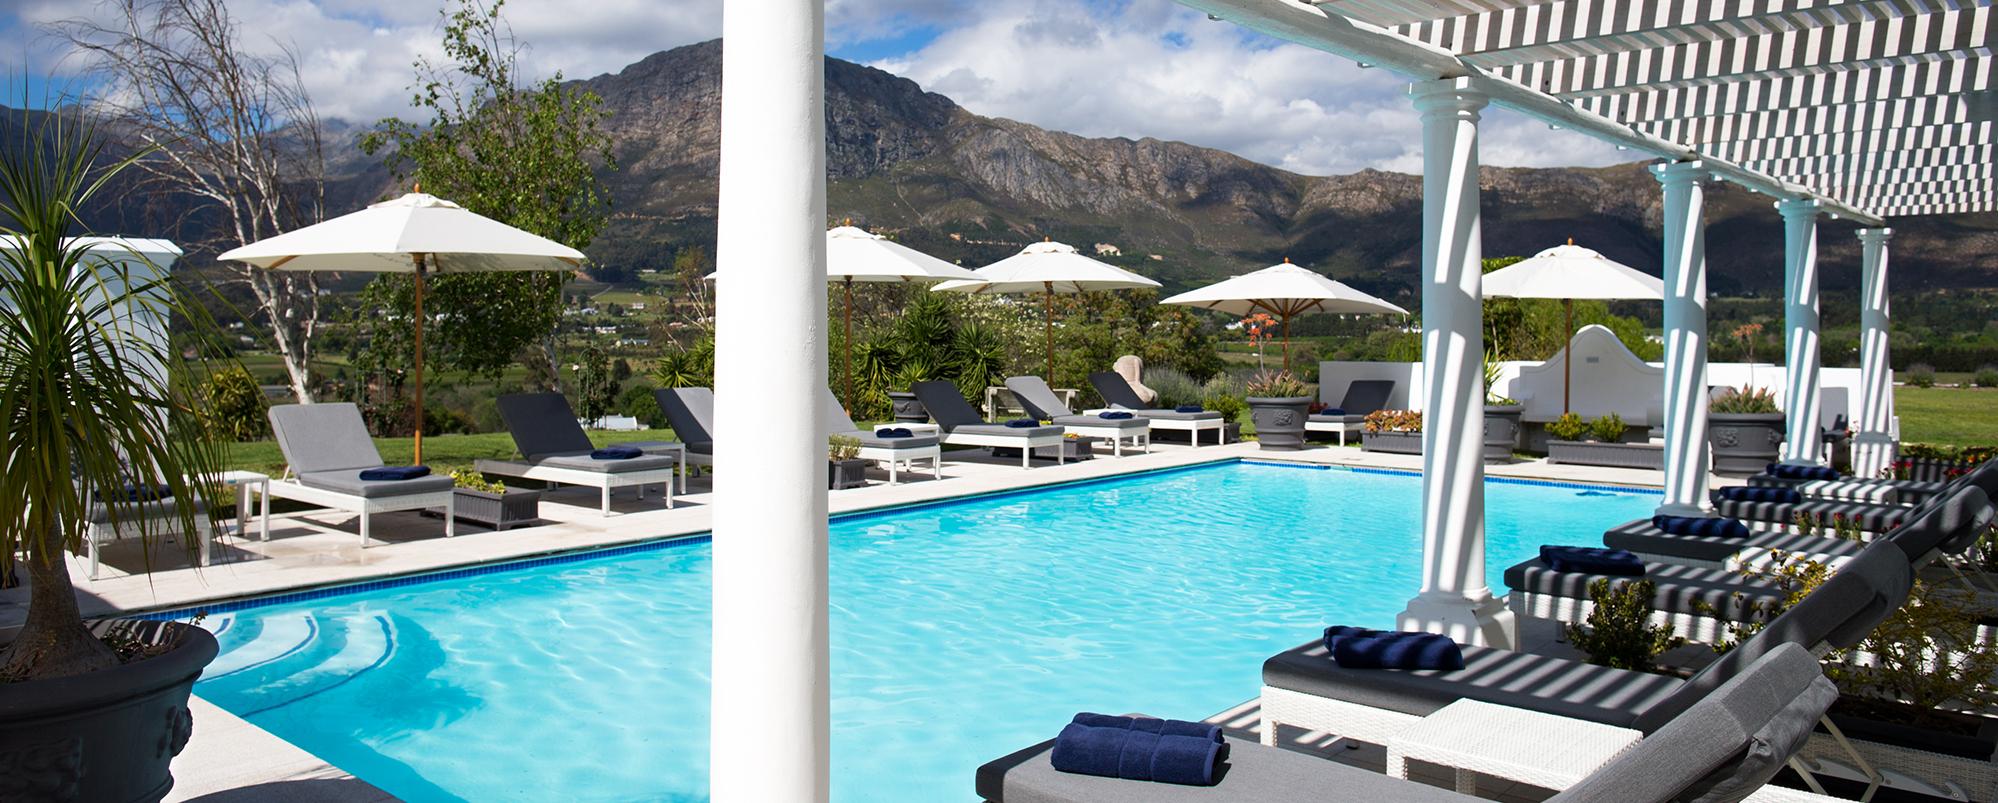 mont-rochelle-outdoor-pool